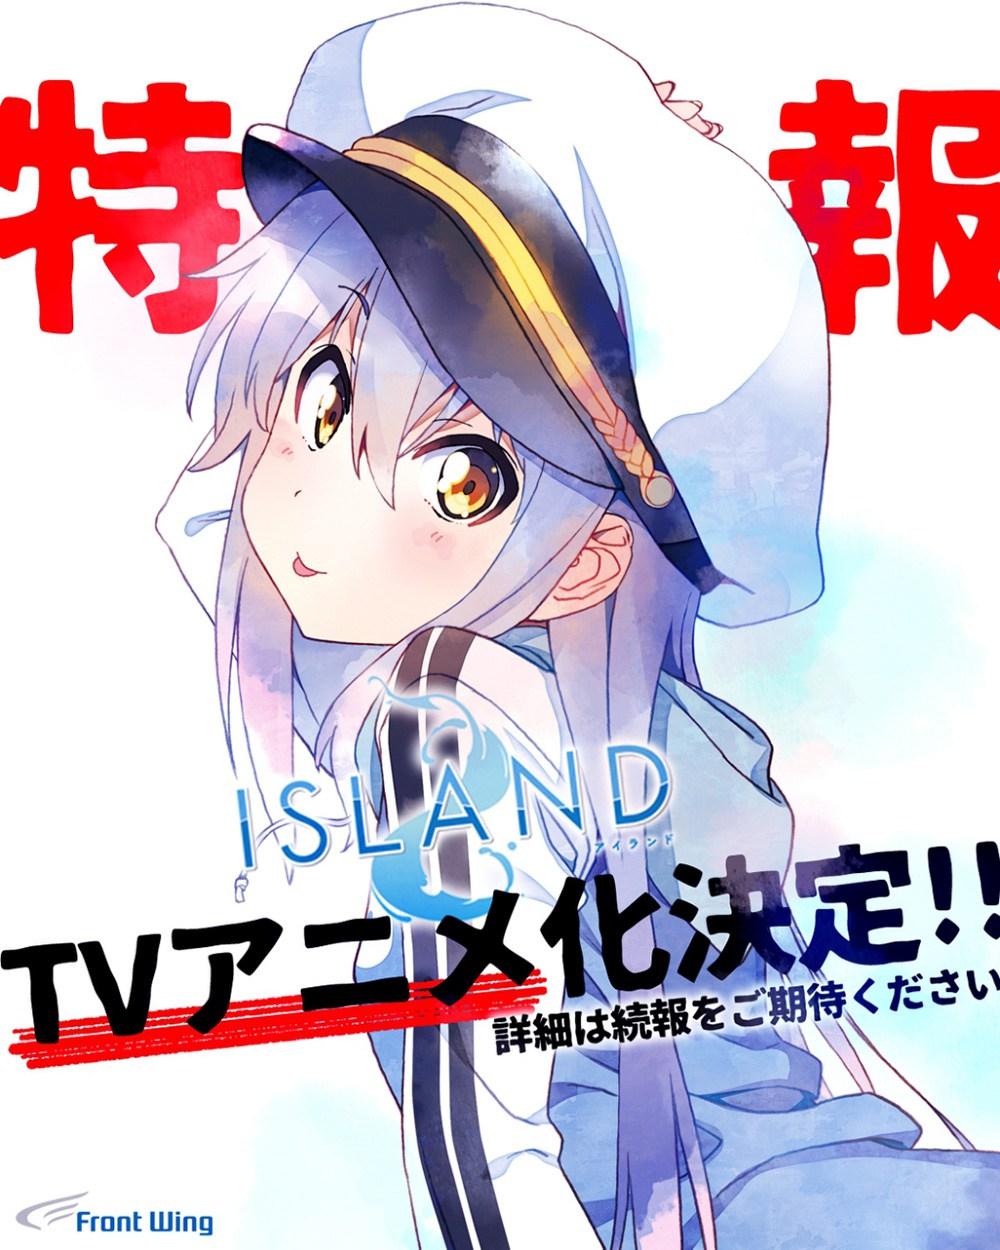 Island-TV-Anime-Announcement